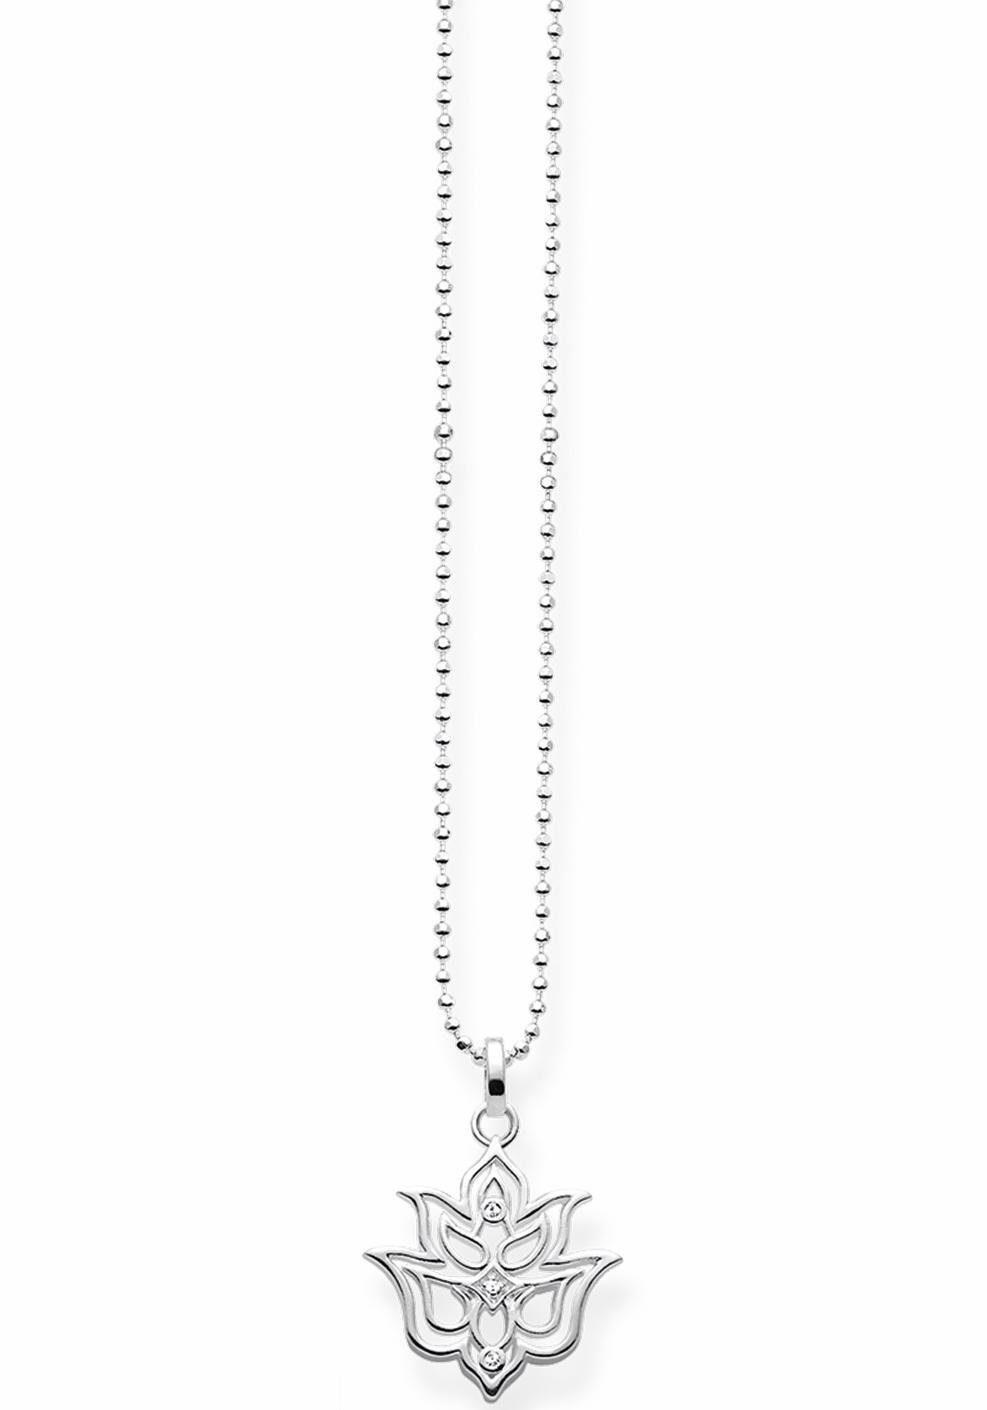 THOMAS SABO Kette mit Anhänger »Lotos Blüte Ornamentik, D_KE0016-725-21-L45v« mit Diamanten